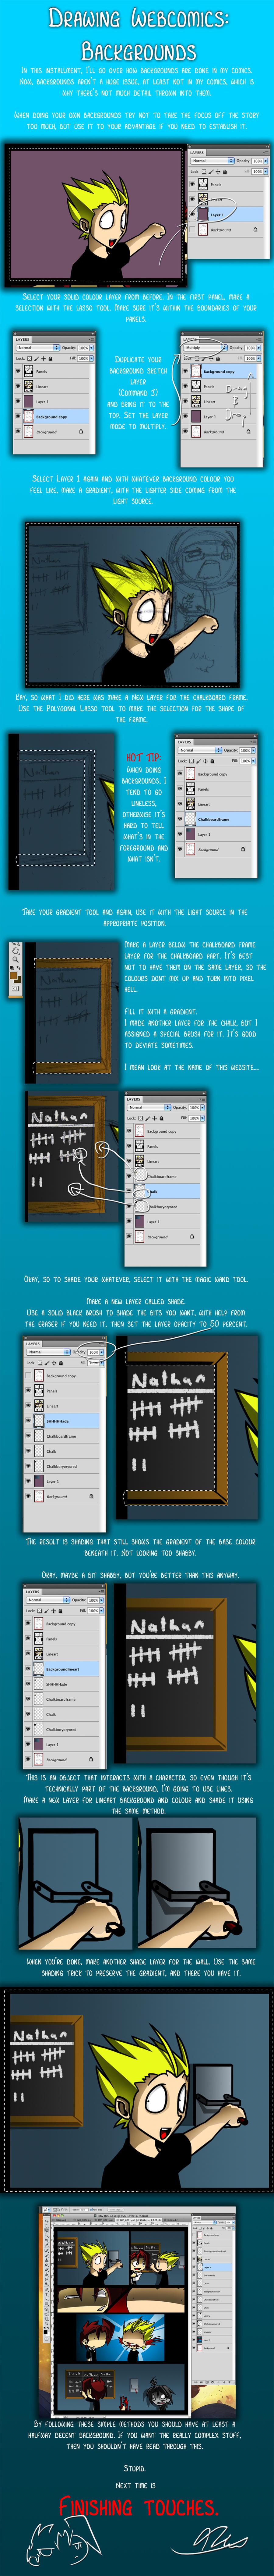 Webcomics: Backgrounds by TrebleChibi